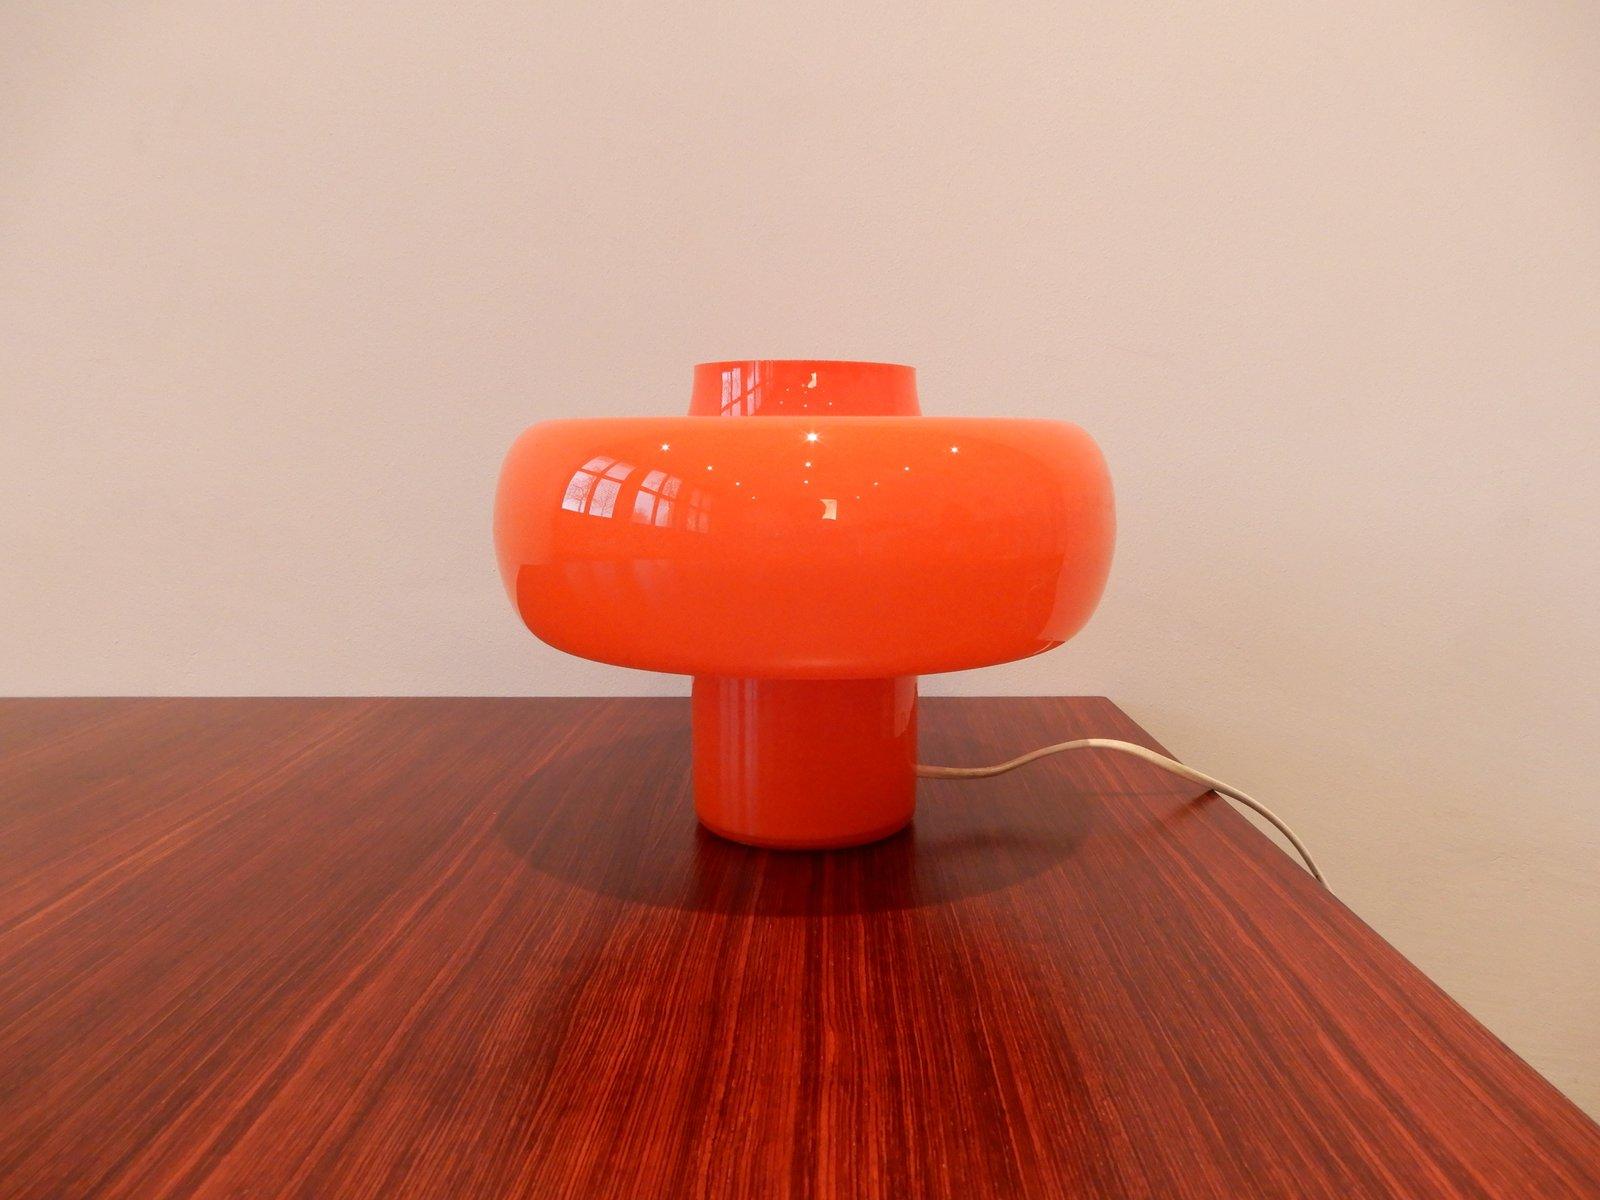 Orangefarbene Vintage Tischlampe aus Glas, 1960er